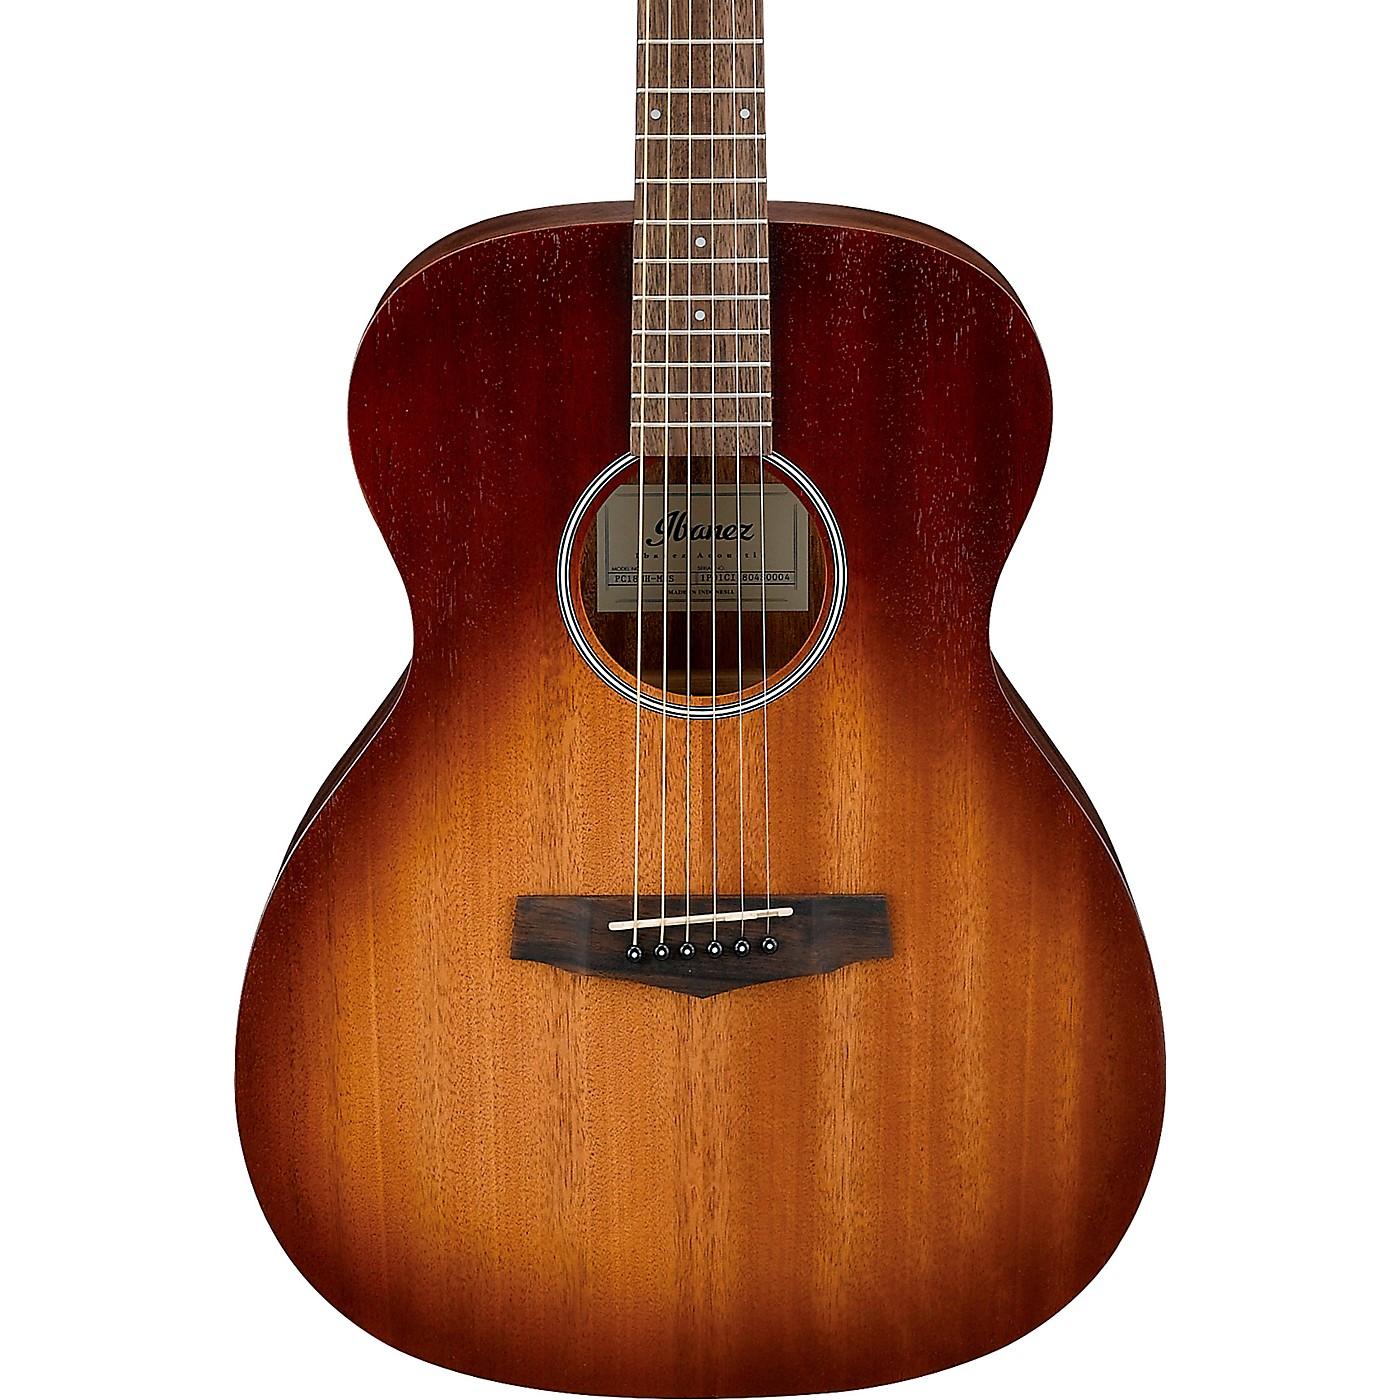 Ibanez PC18MHMHS Mahogany Grand Concert Acoustic Guitar thumbnail